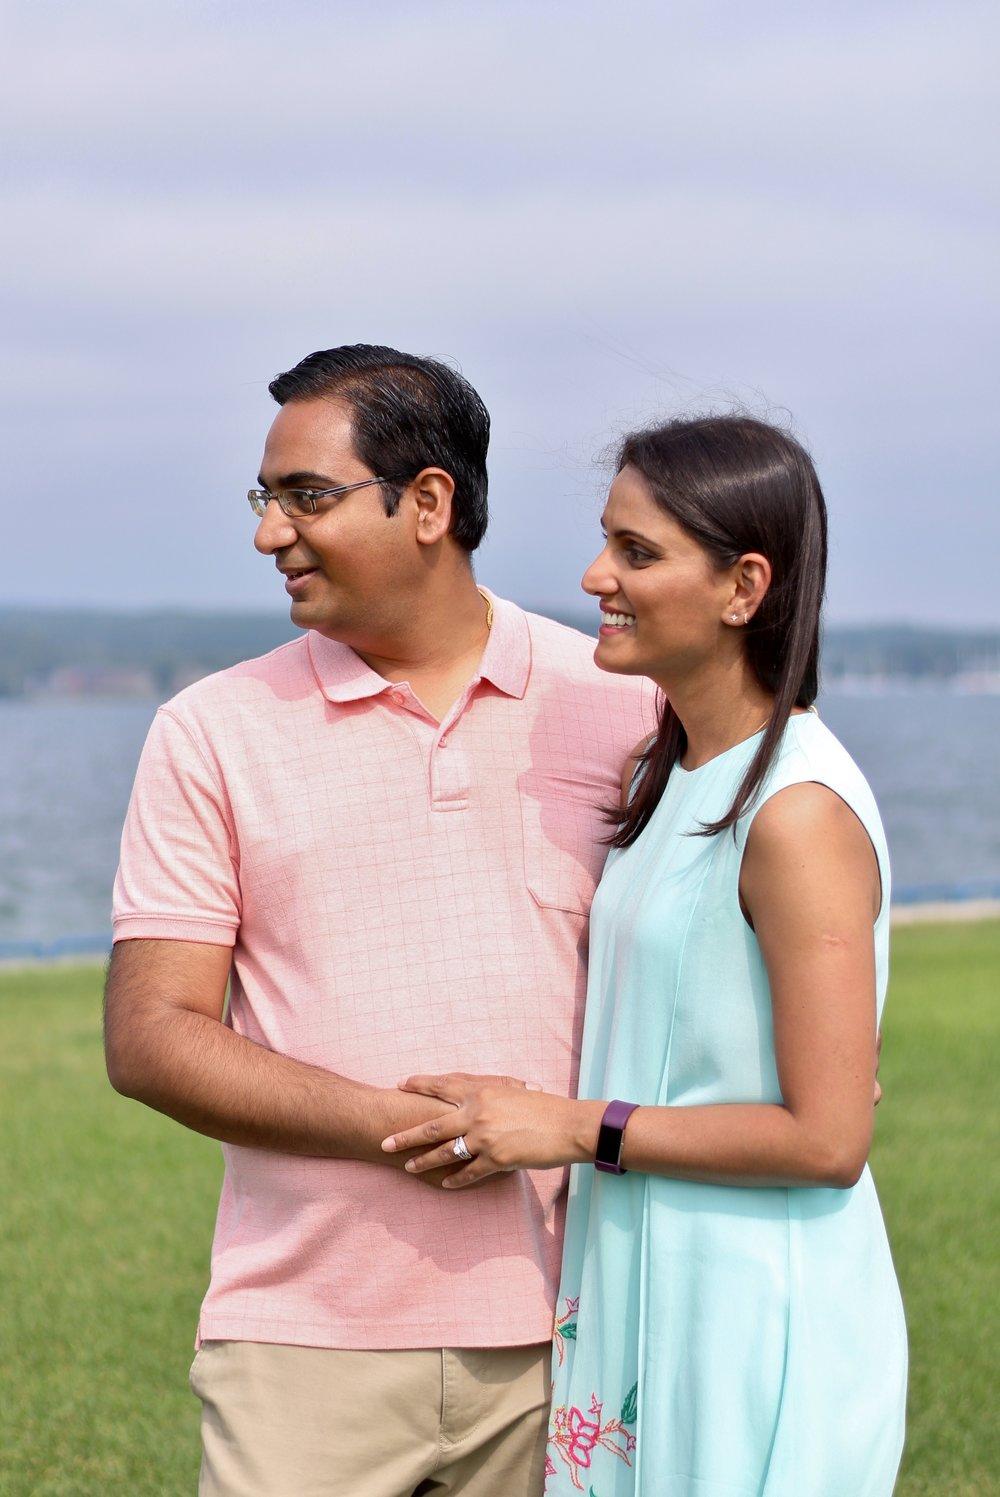 Patel Family Traverse City August 2018 (15).JPG